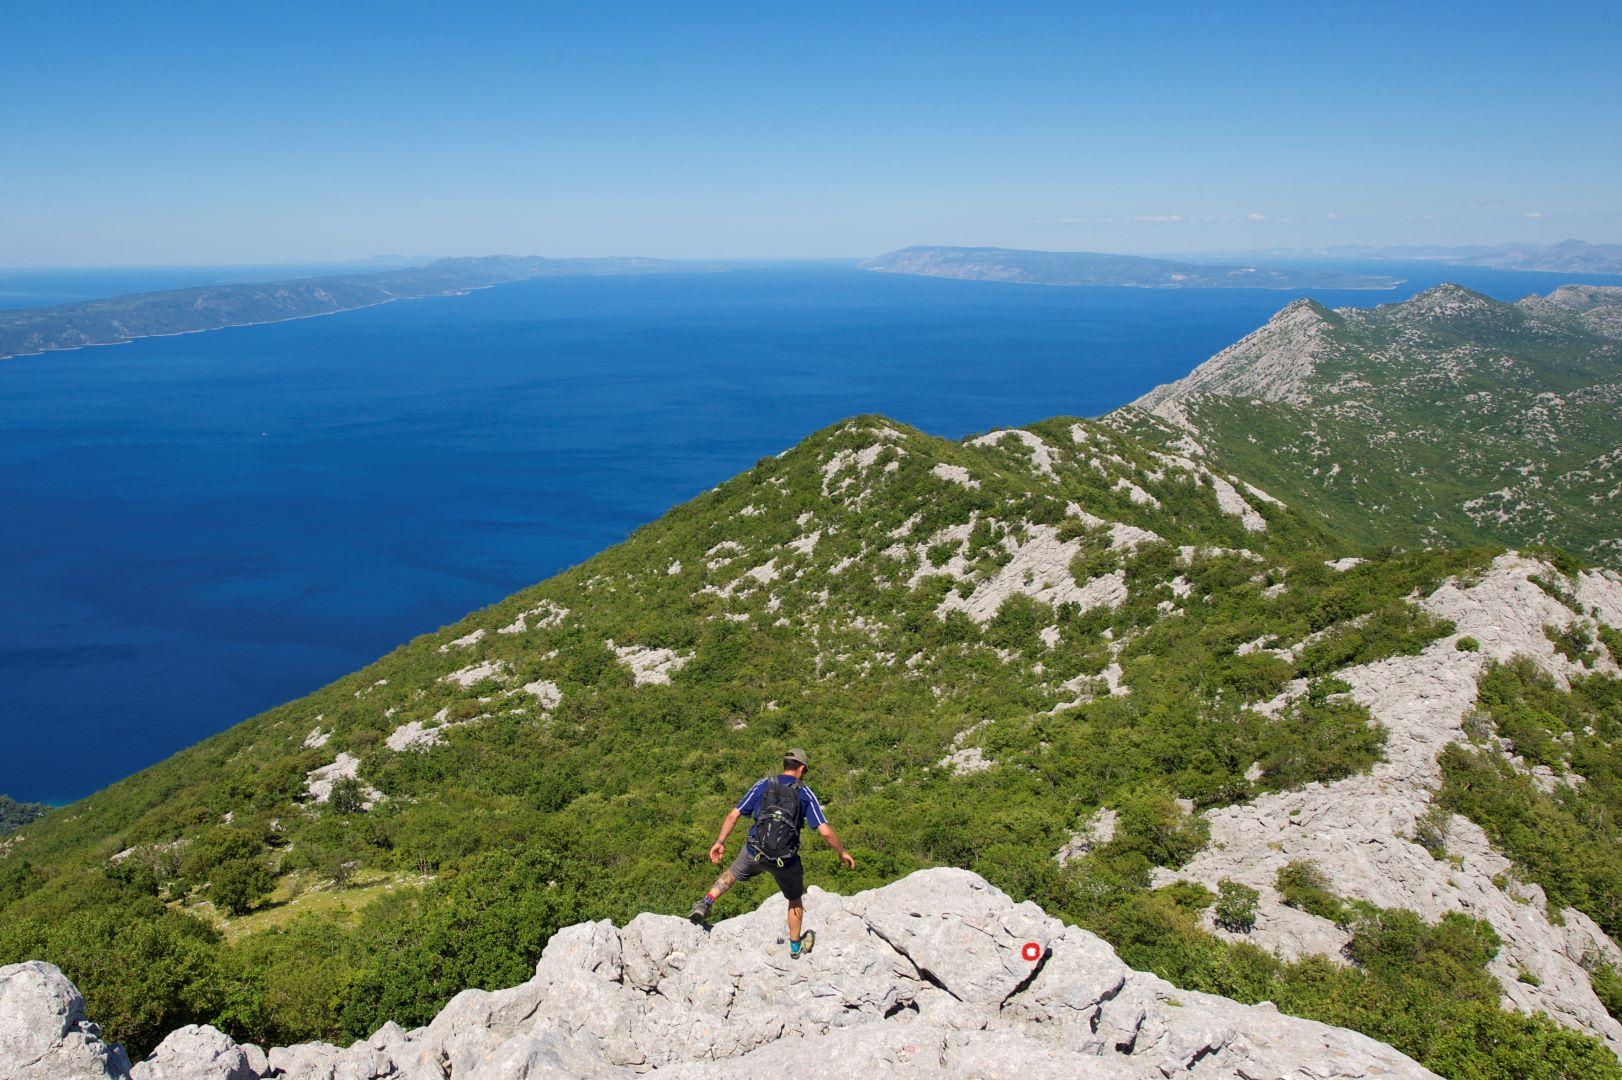 Kroatien: Gipfelhüpfen an der Adriaküste entlang